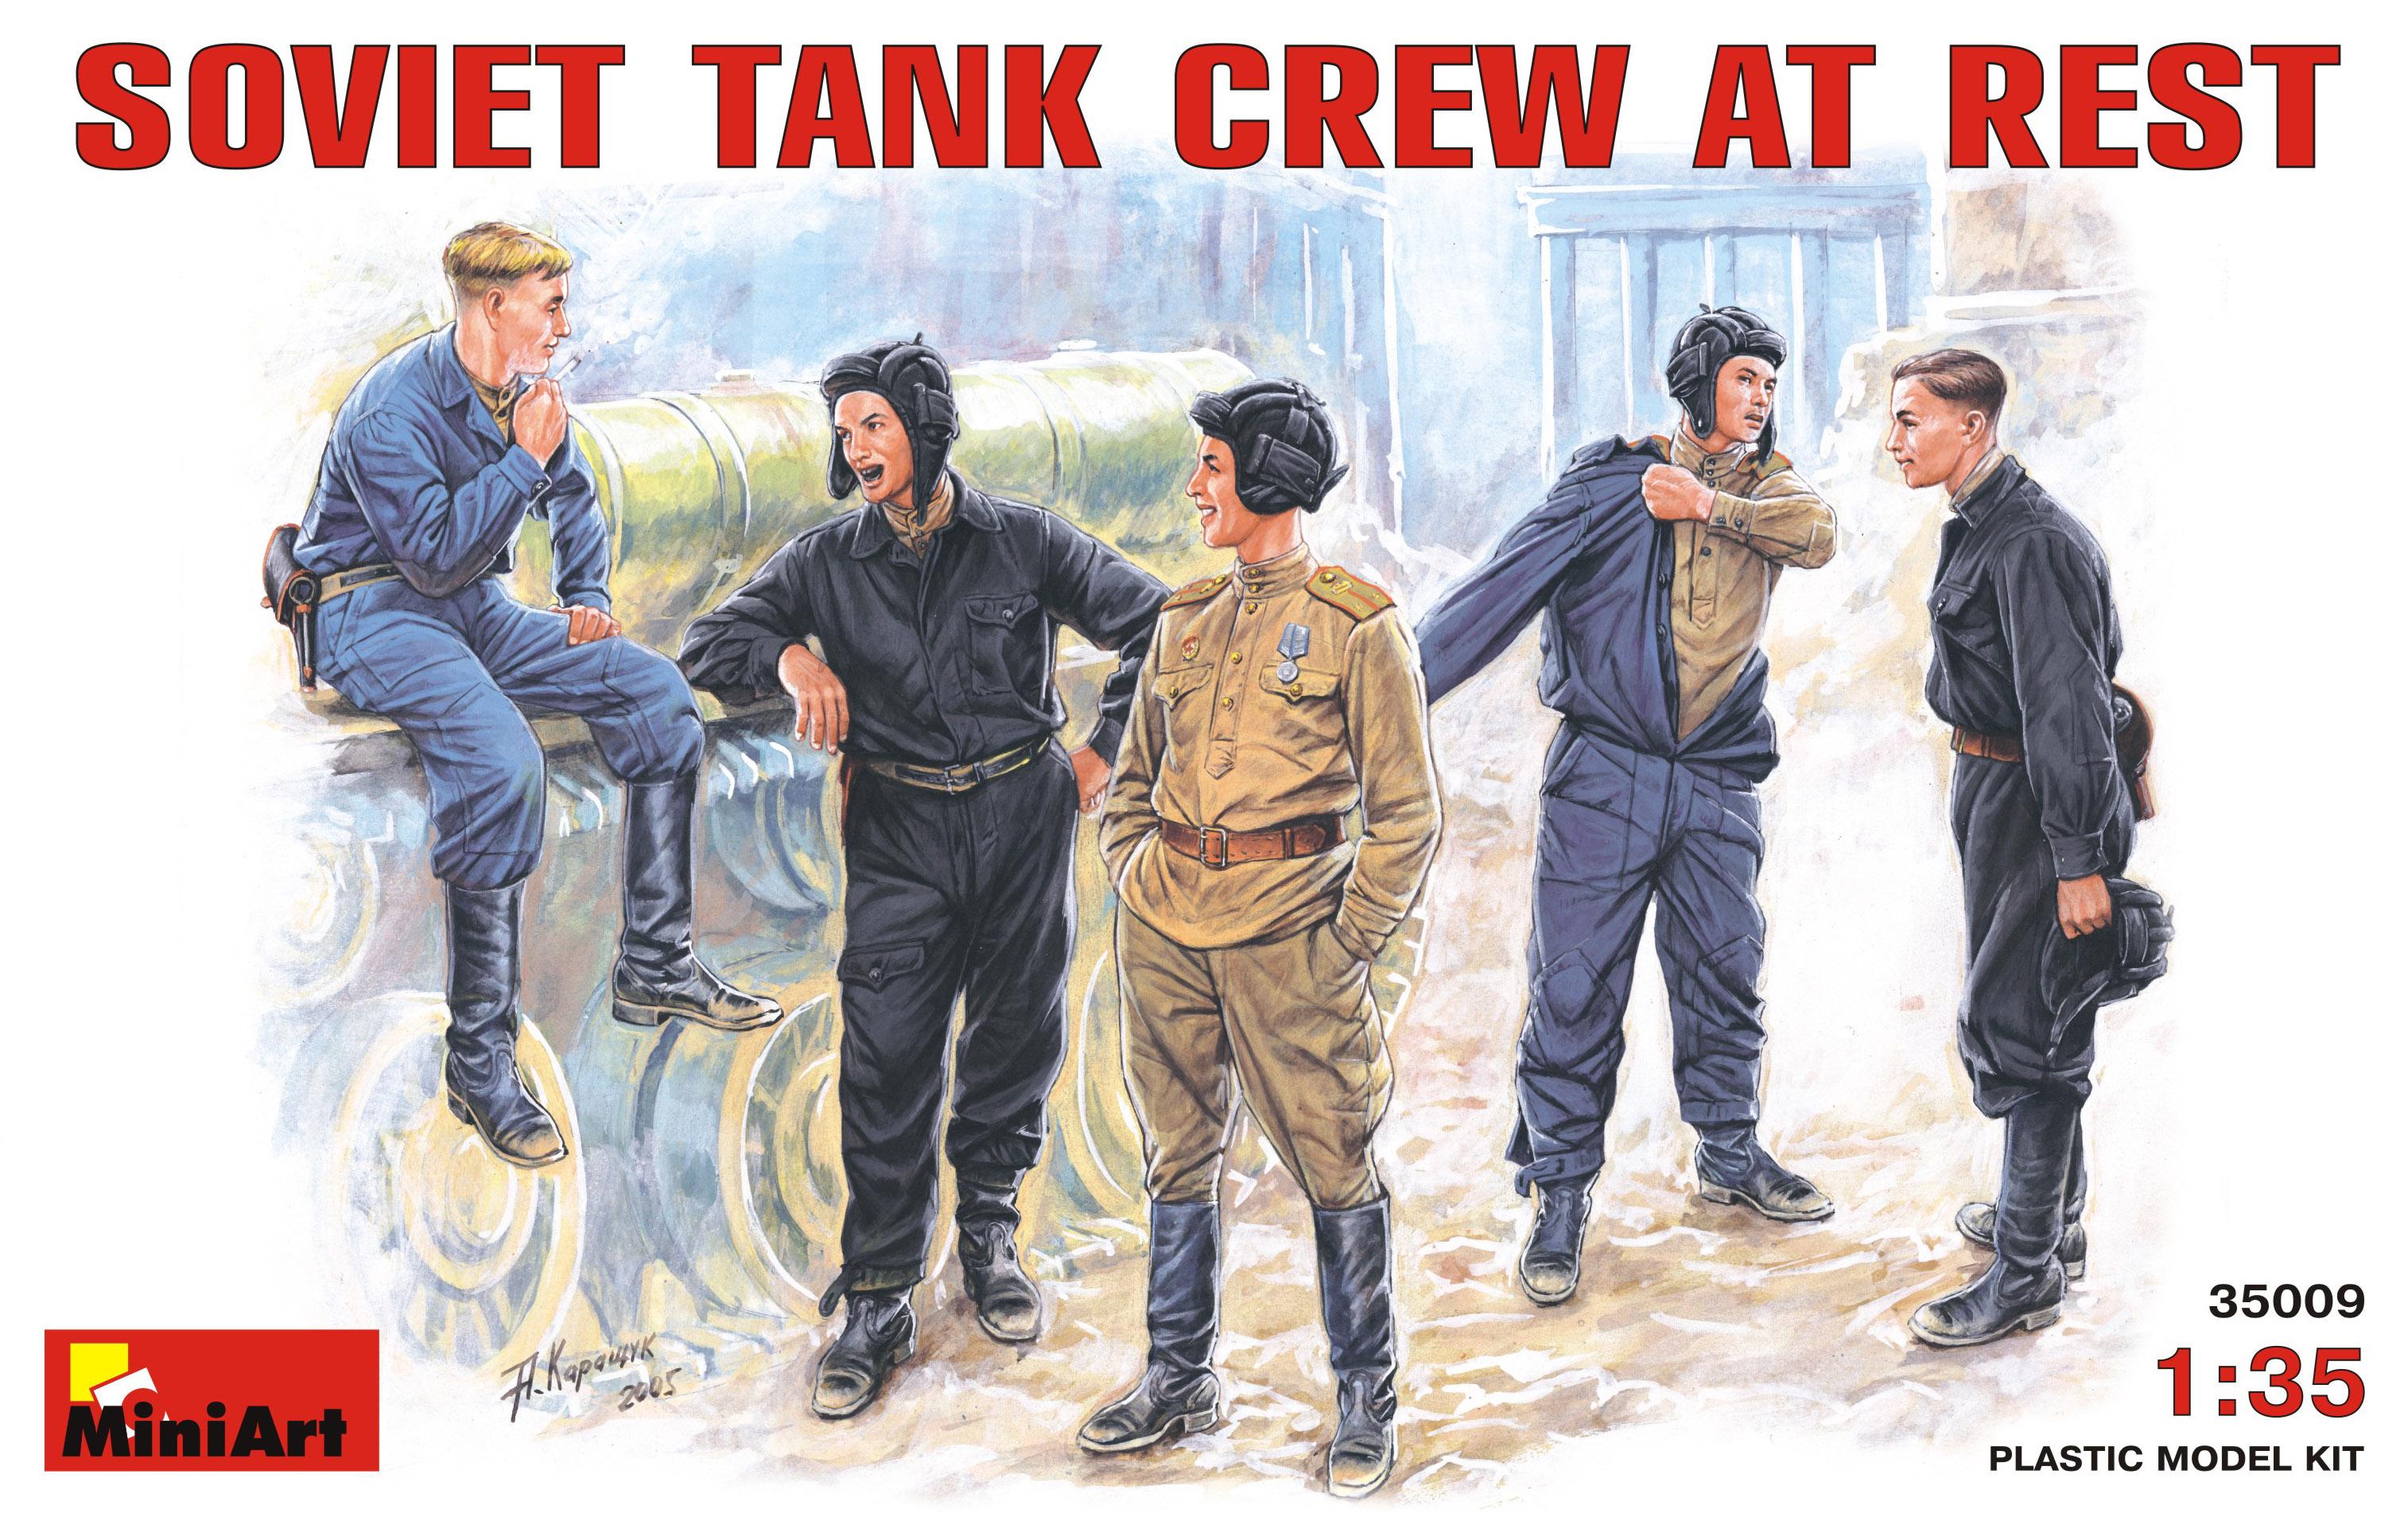 35009 SOVIET TANK CREW AT REST